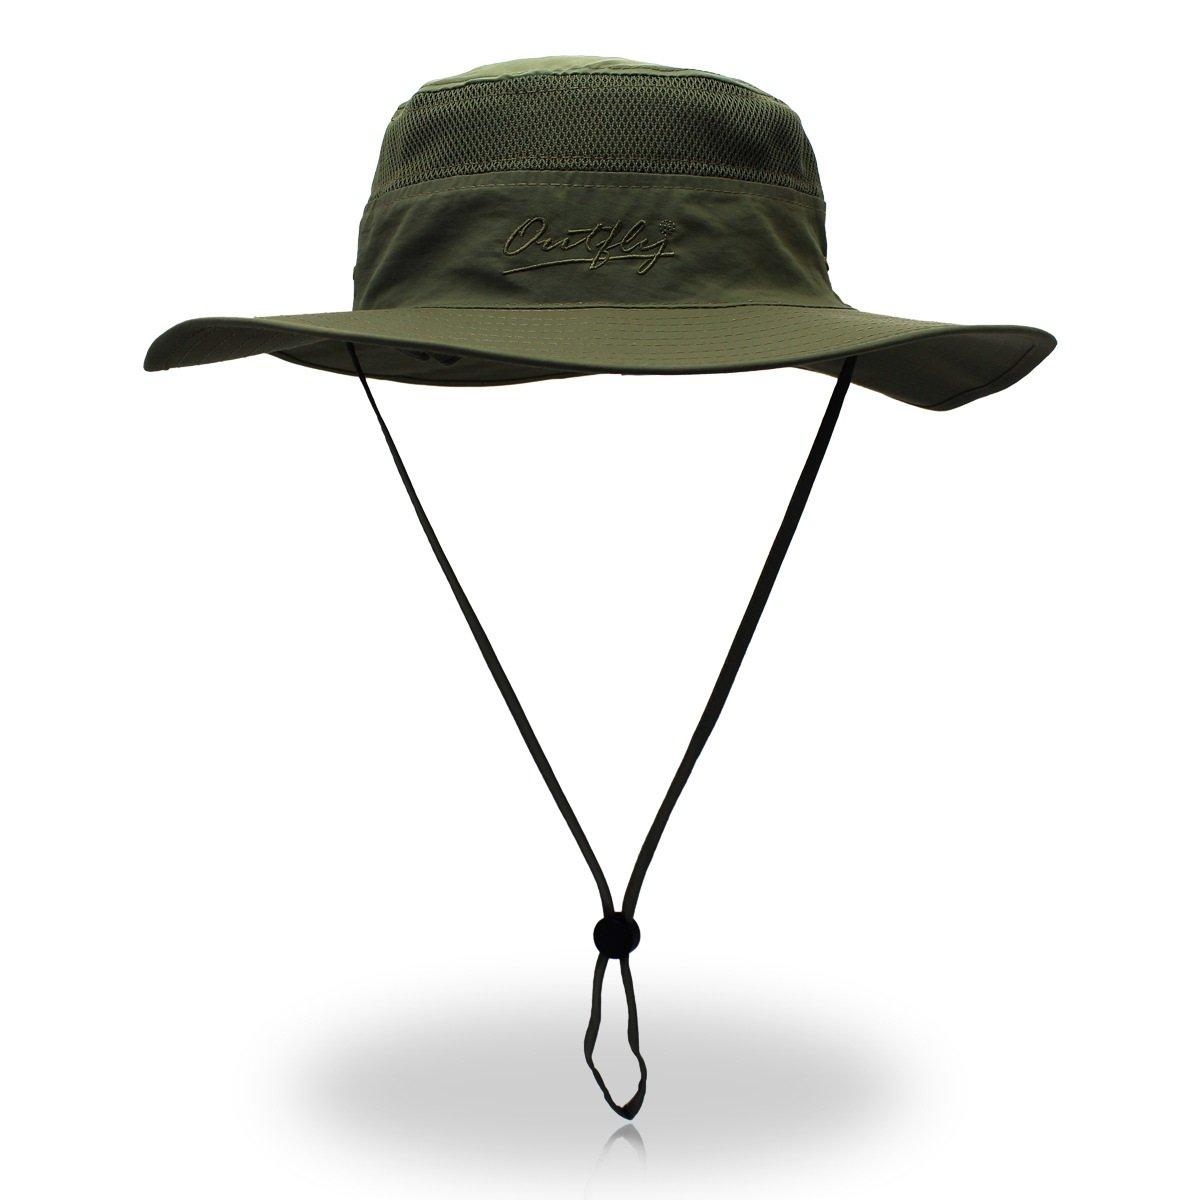 duakrsユニセックスWide Brim Sun Hat、アウトドアUPF 50 +防水Boonie帽子夏UV保護太陽キャップ B07C4VPKX9 アーミーグリーン アーミーグリーン